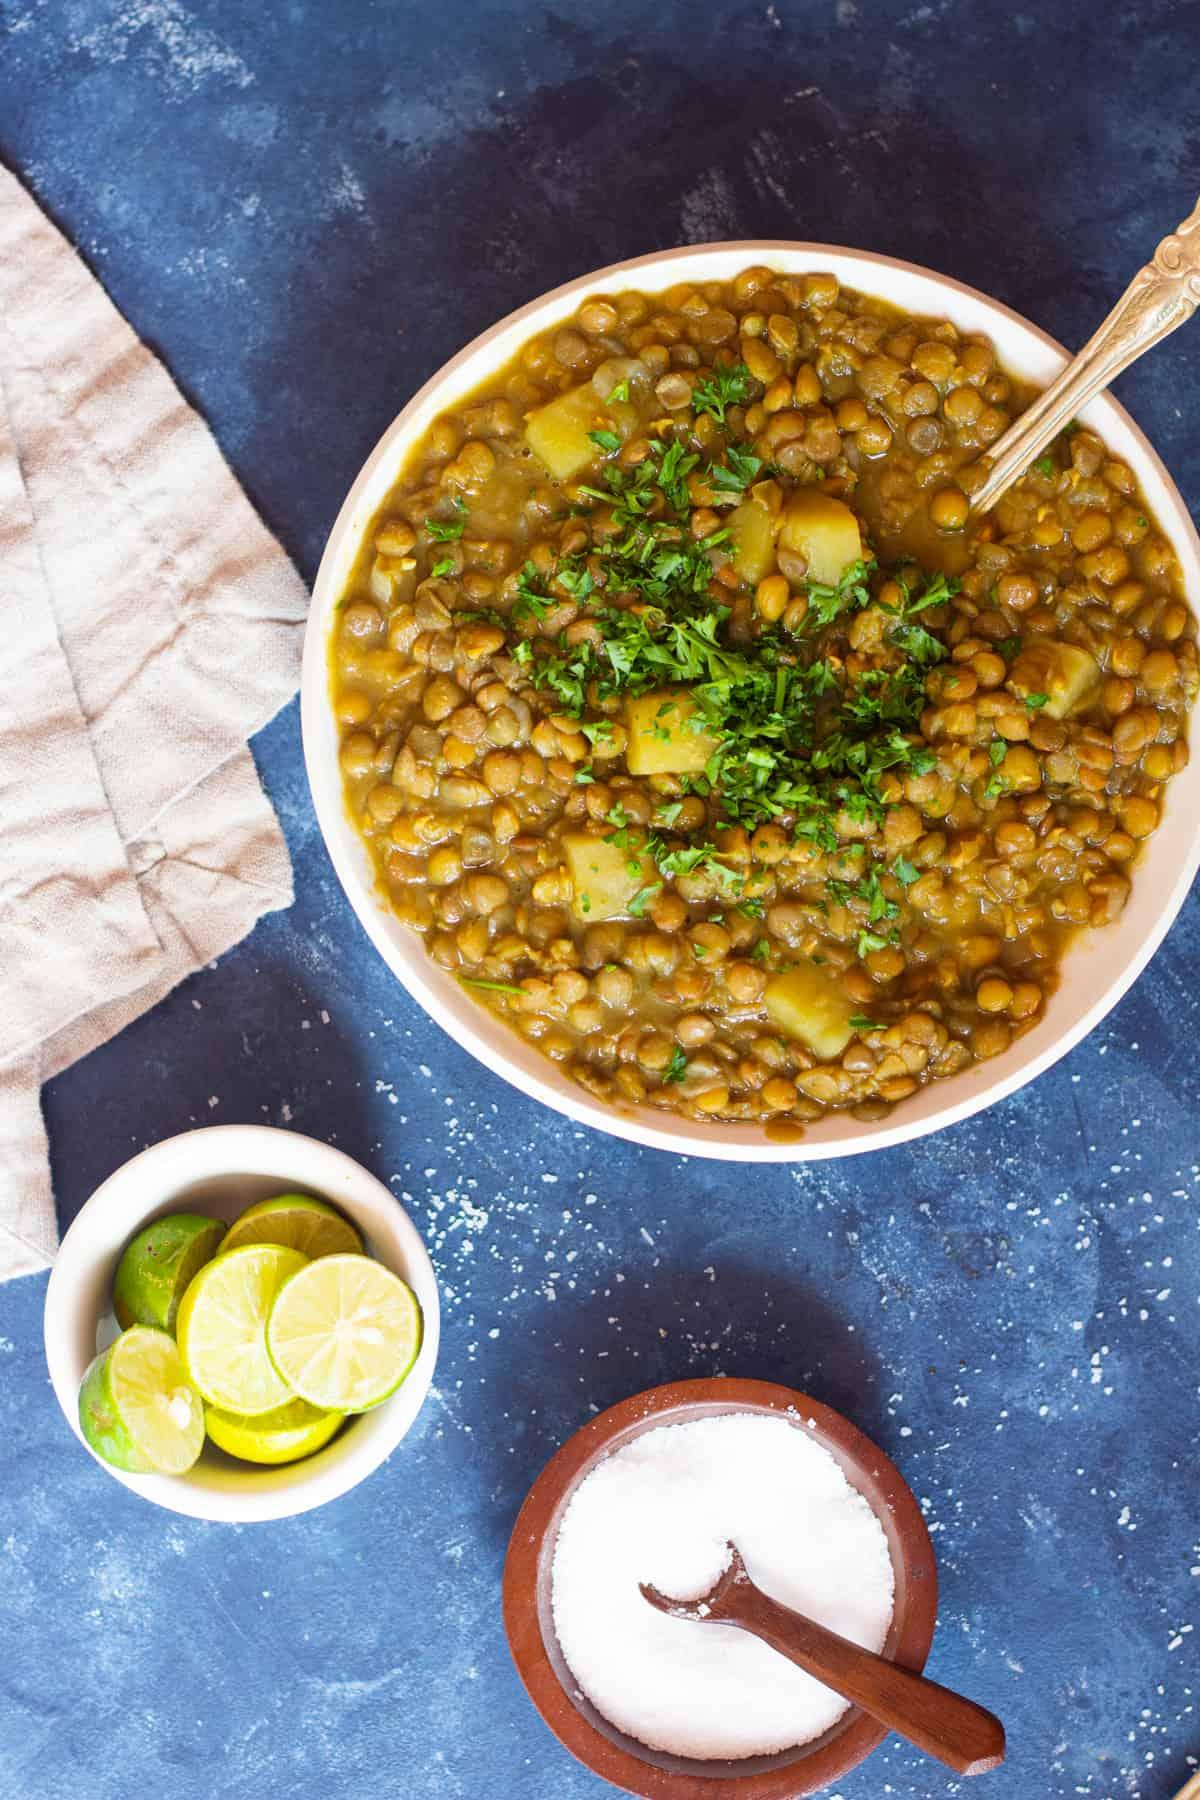 A bowl of lentil soup with lime juice.